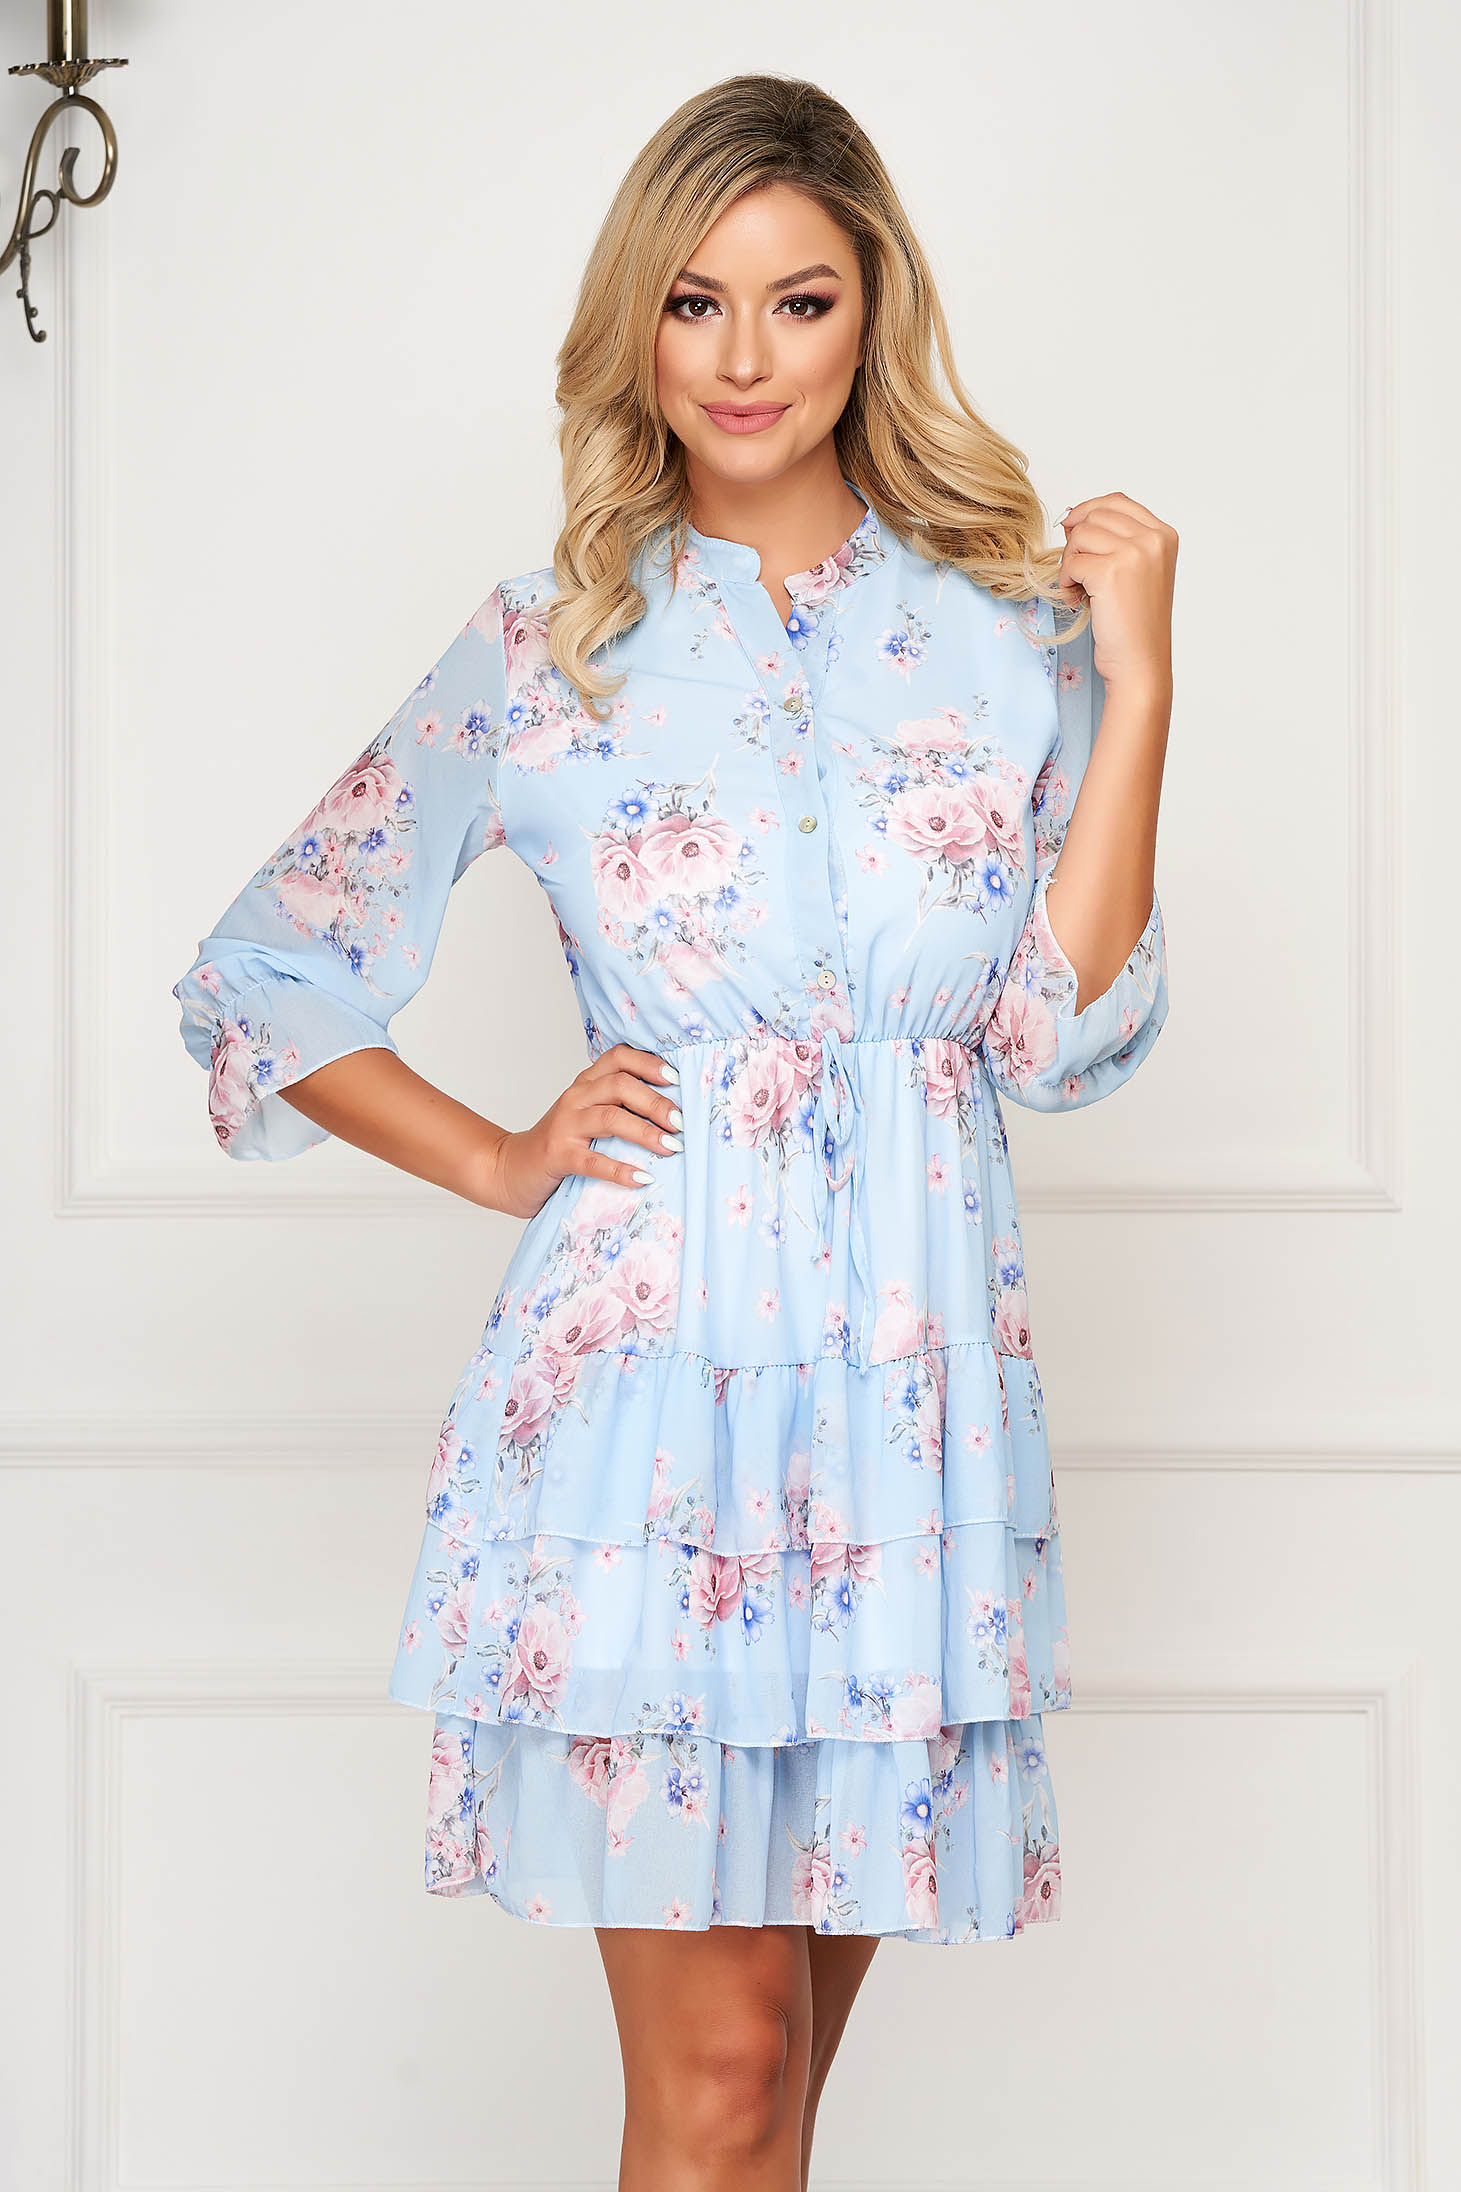 Lightblue dress short cut daily from veil fabric cloche with elastic waist